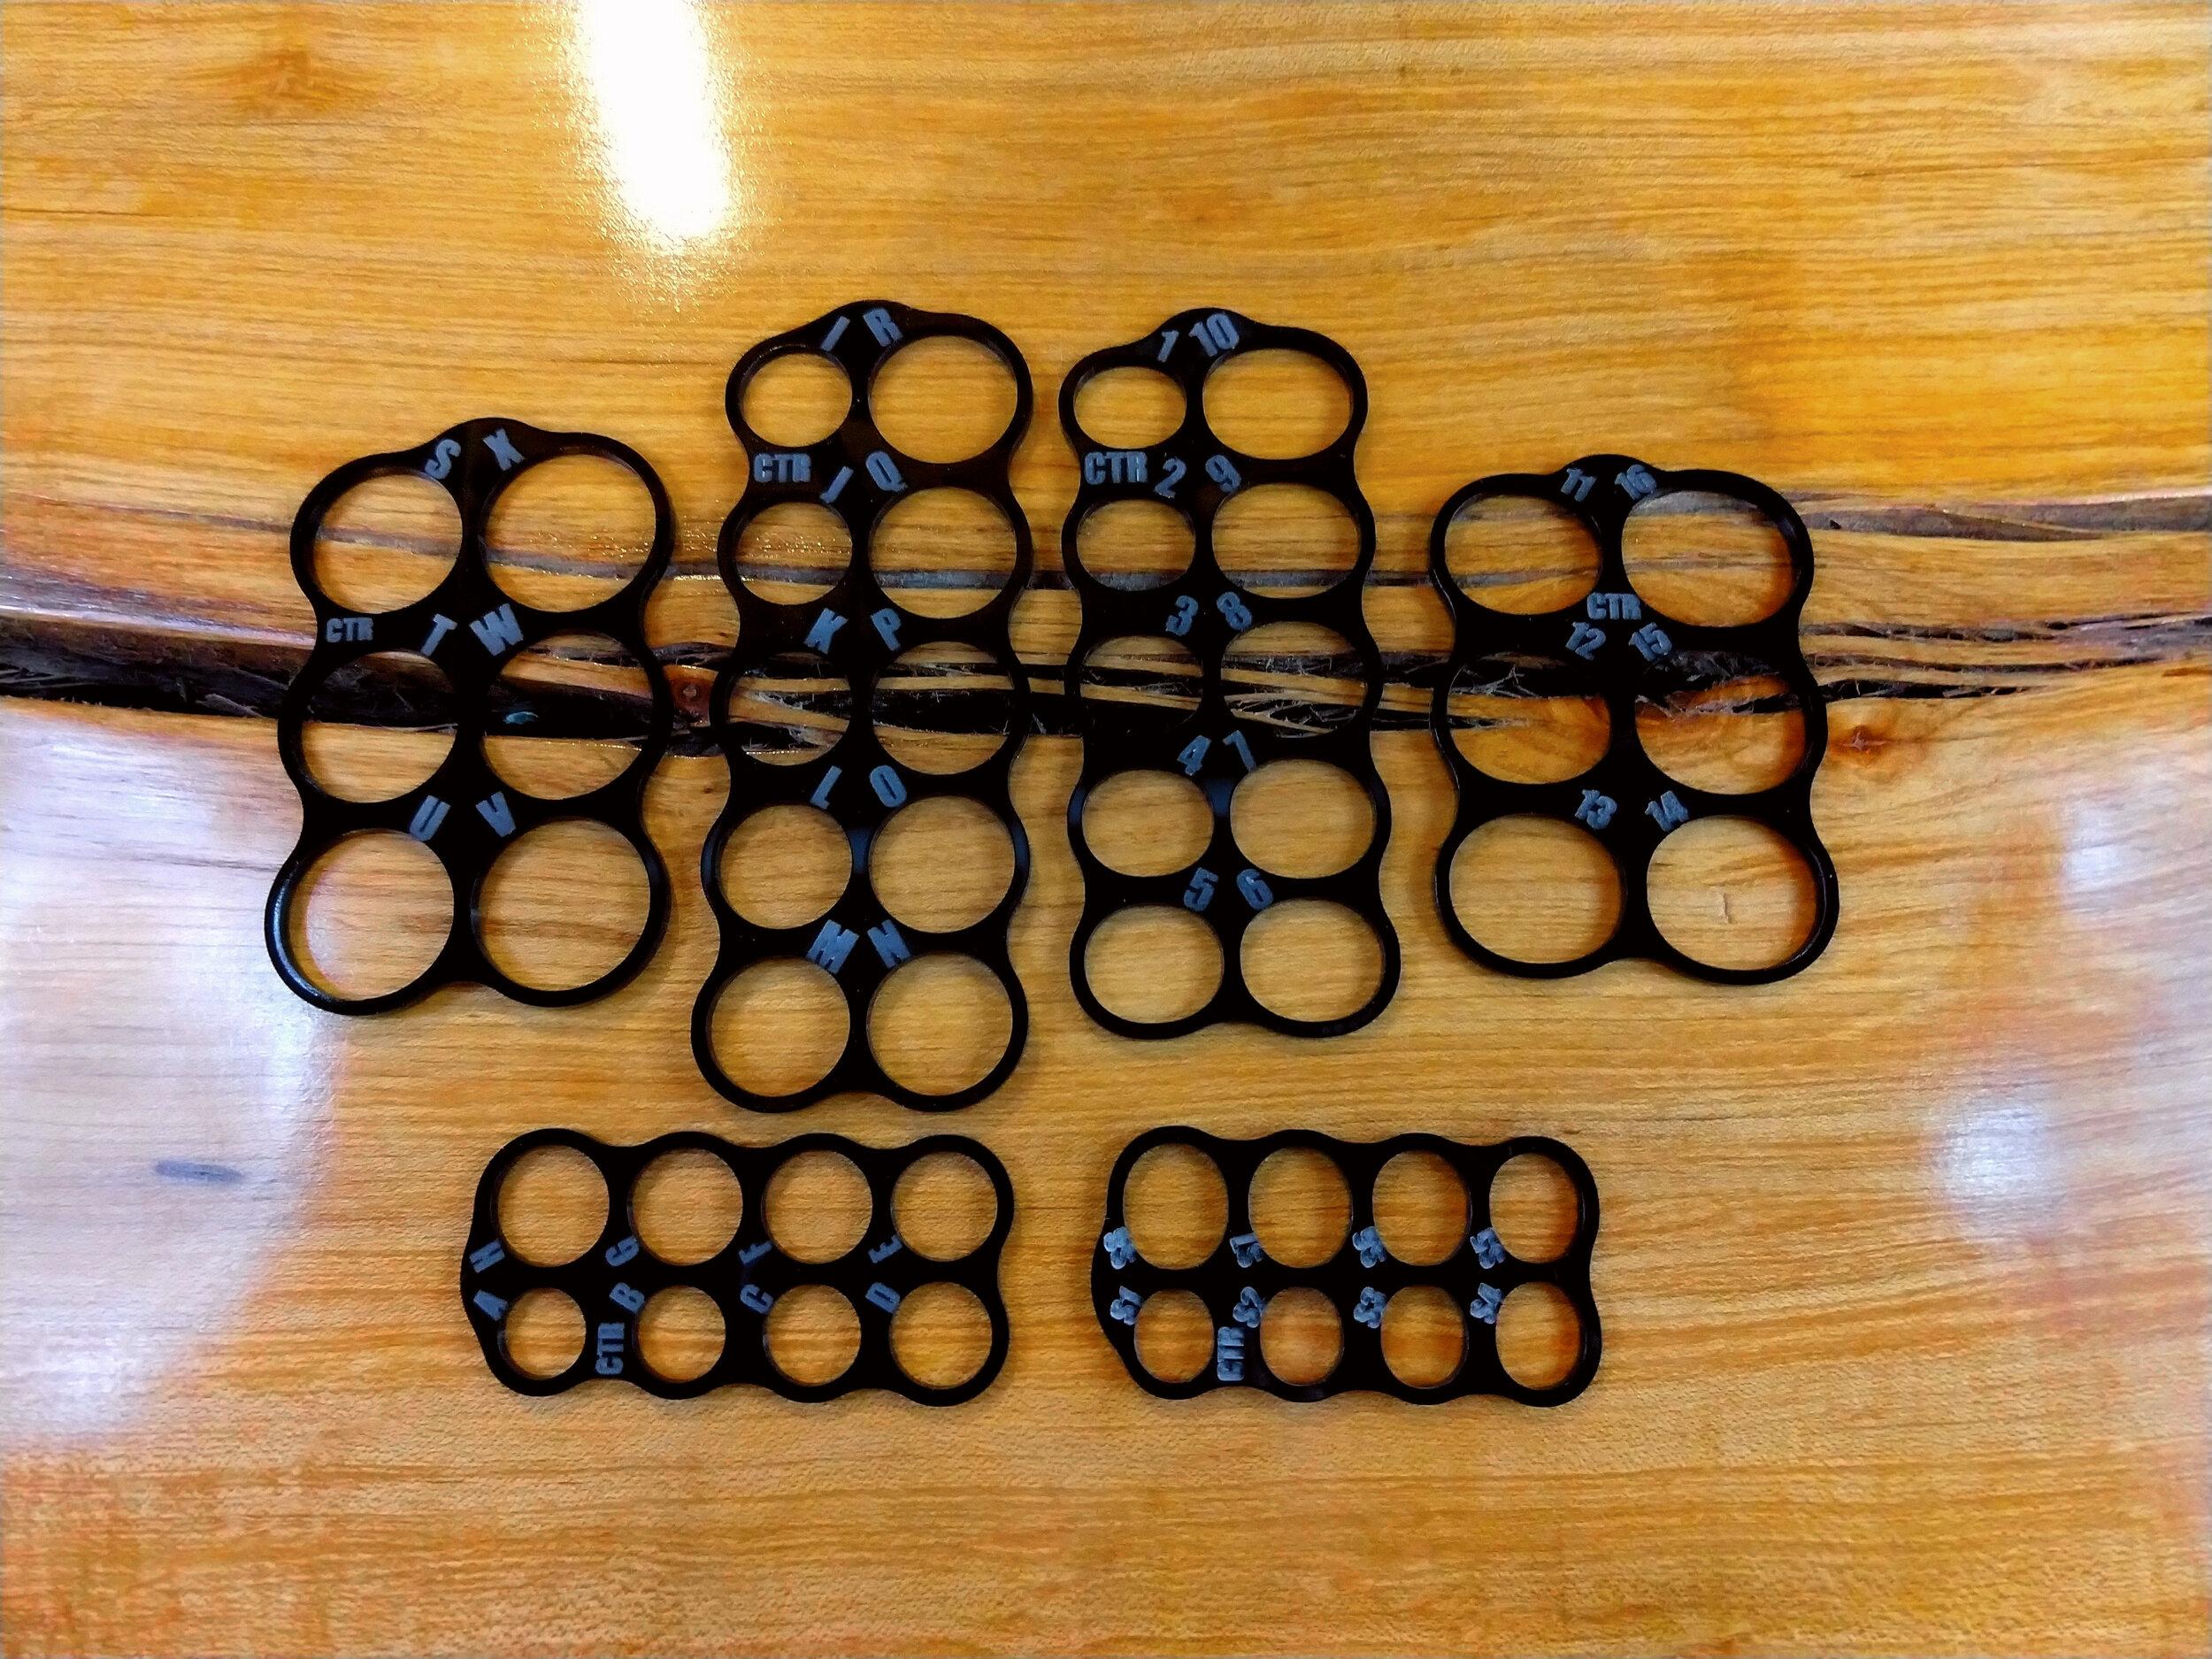 Custom Thumb Rings bespoke ring sizers - the full line